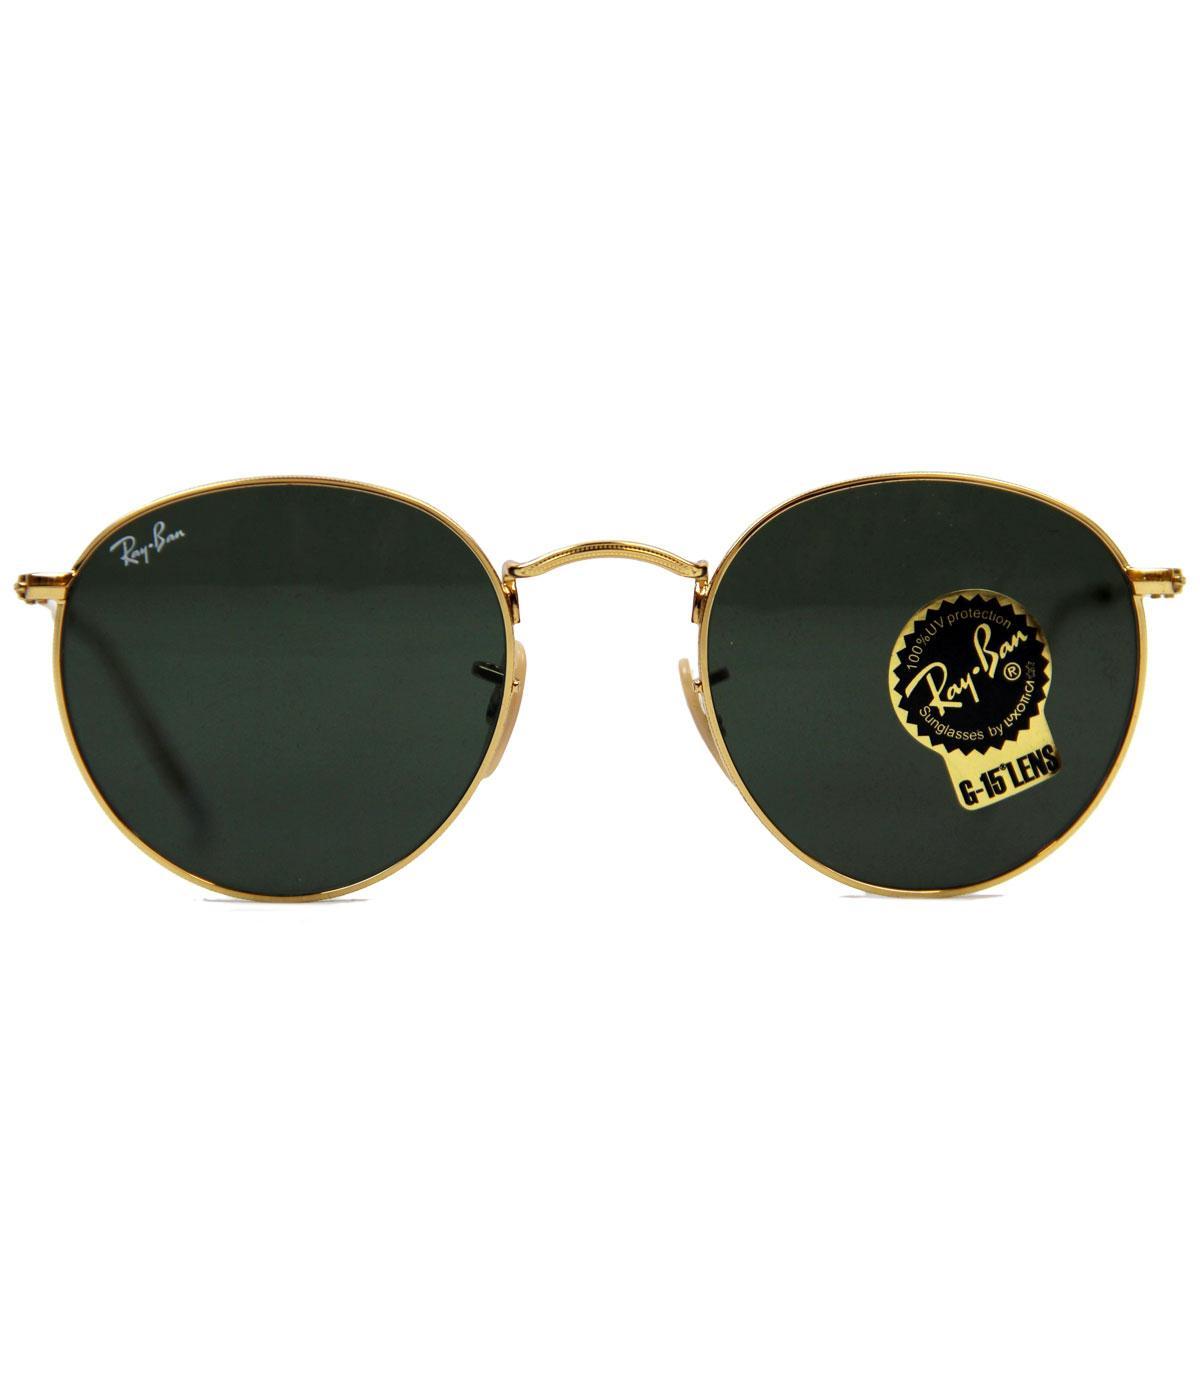 Ray-Ban Retro Mod RB3447 Indie Round Sunglasses G